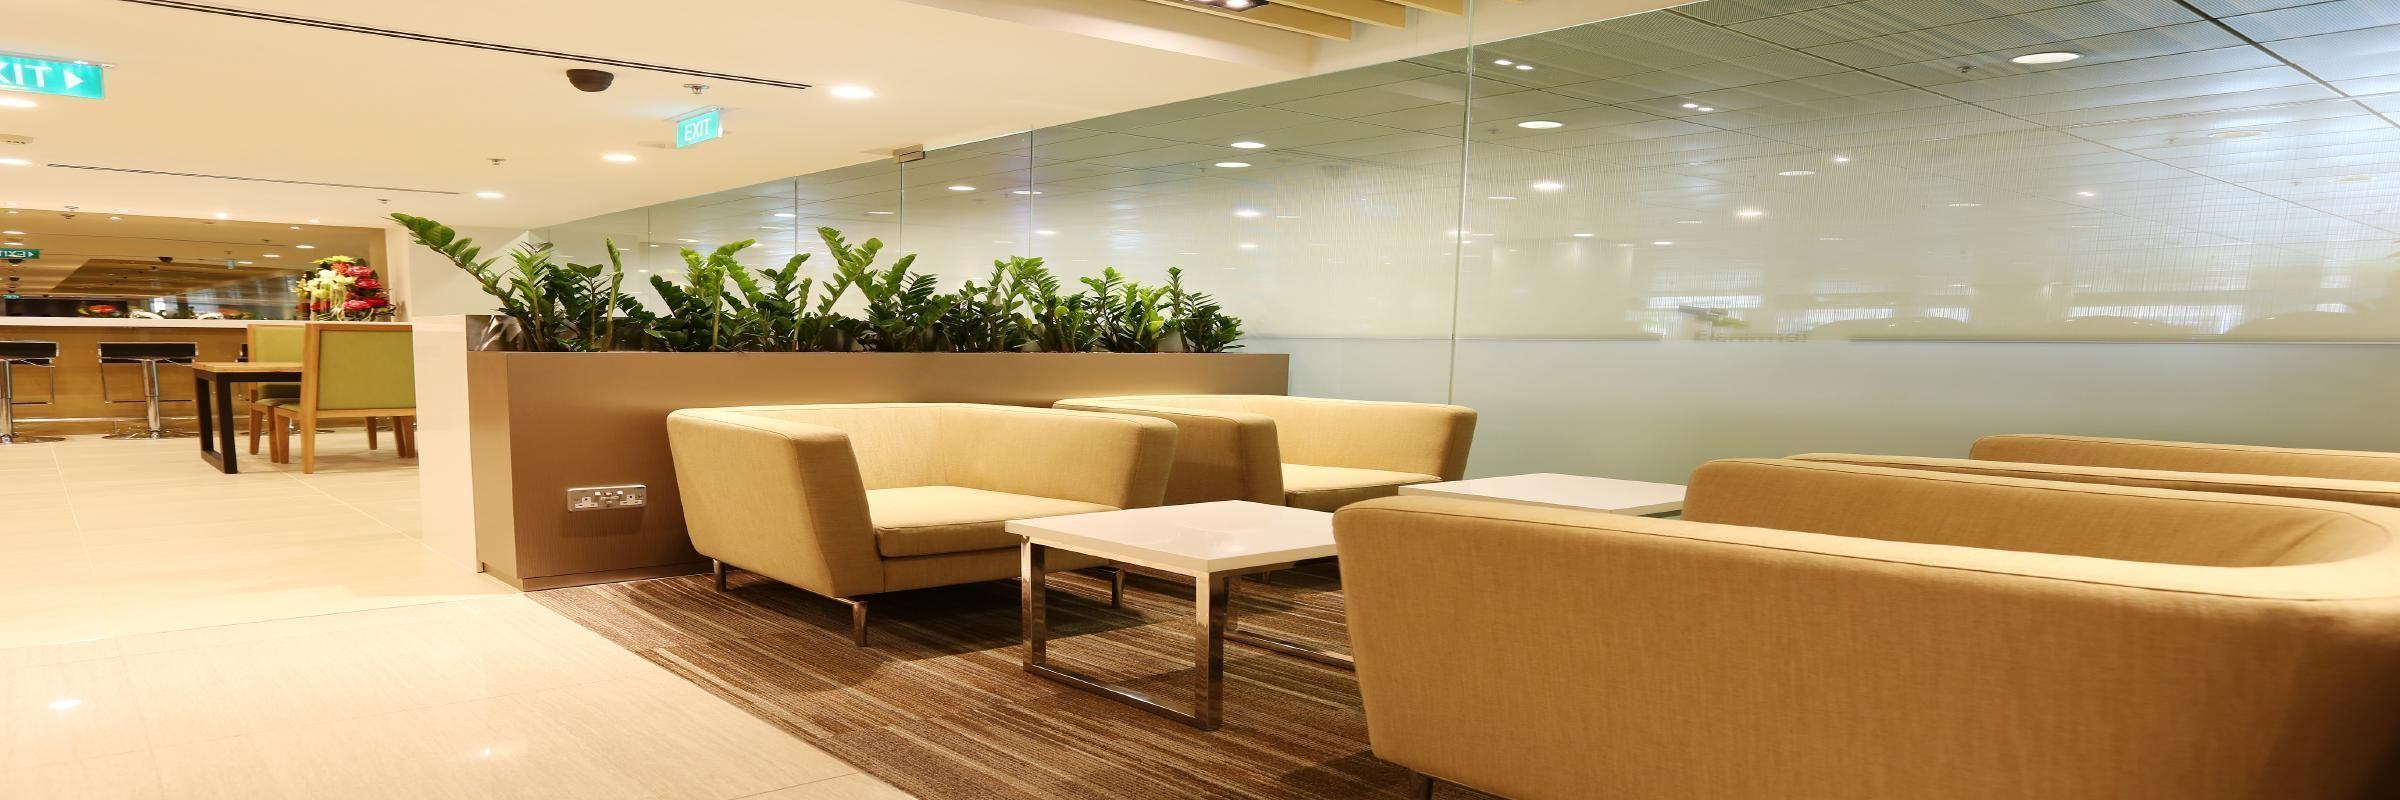 The Haven Single Nap Room at Changi Airport